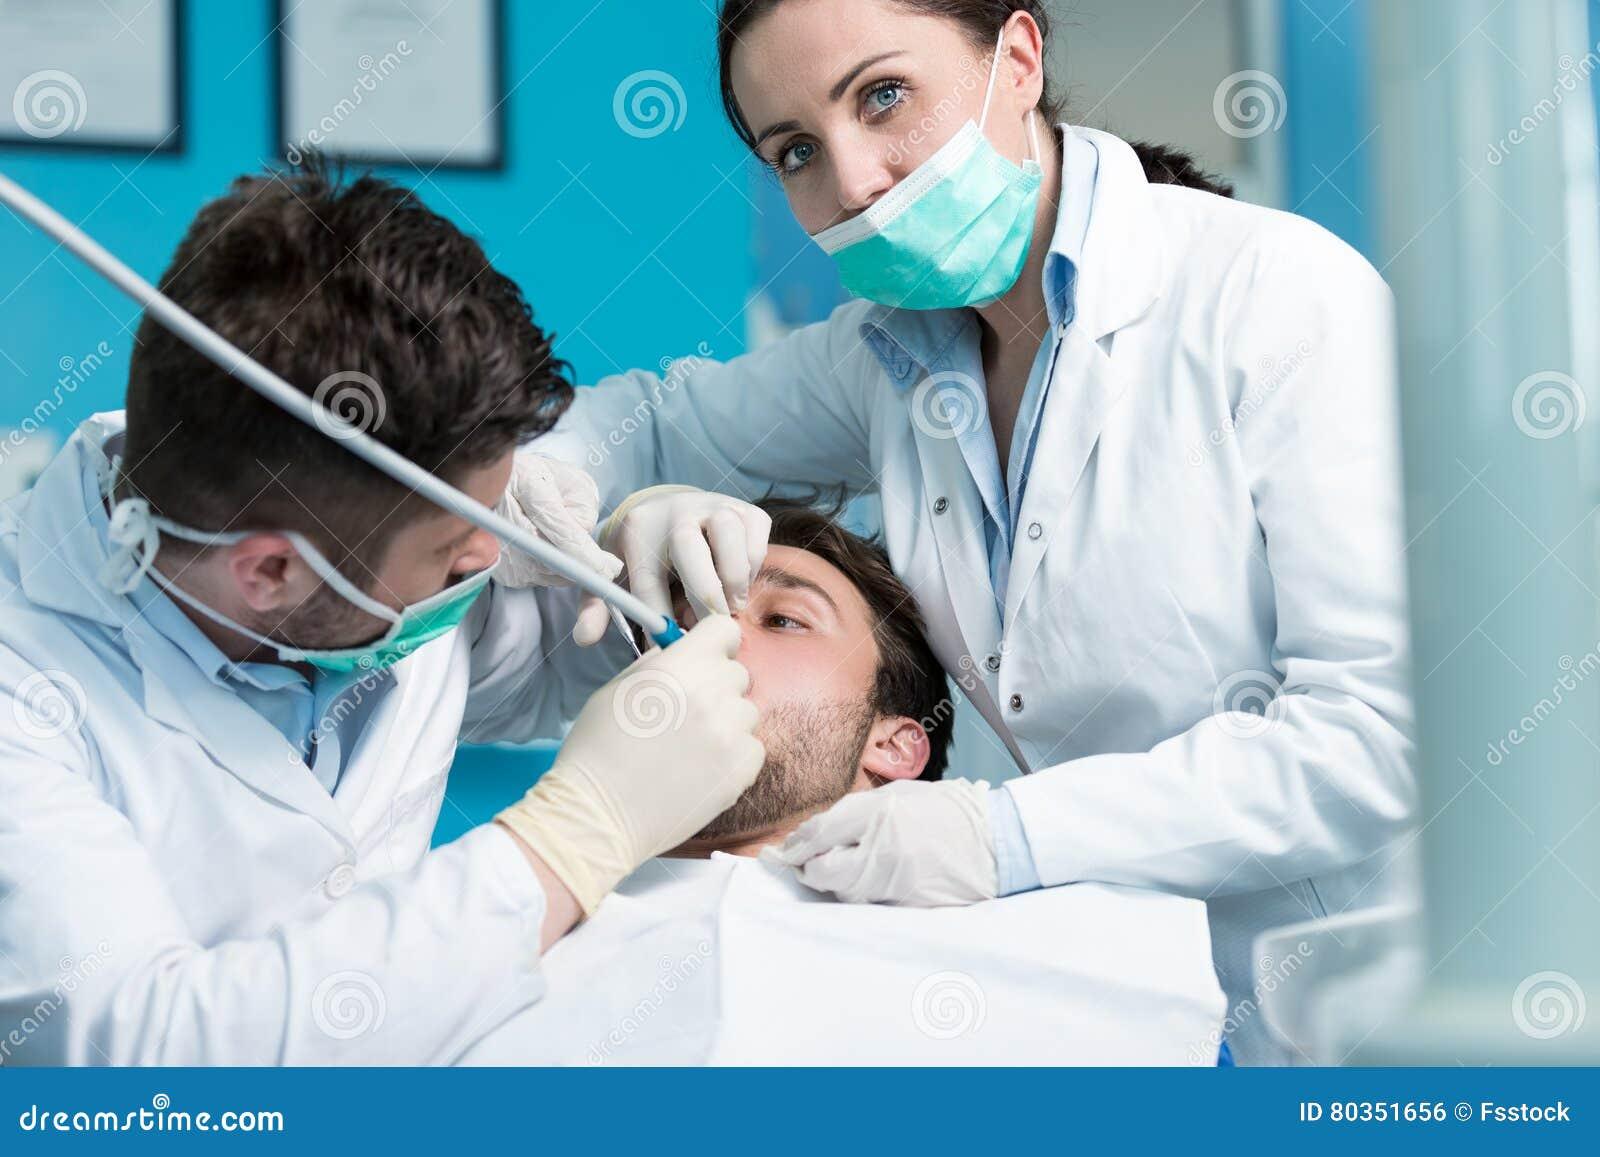 Dentistry education. Male dentist doctor teacher explaining treatment procedure.